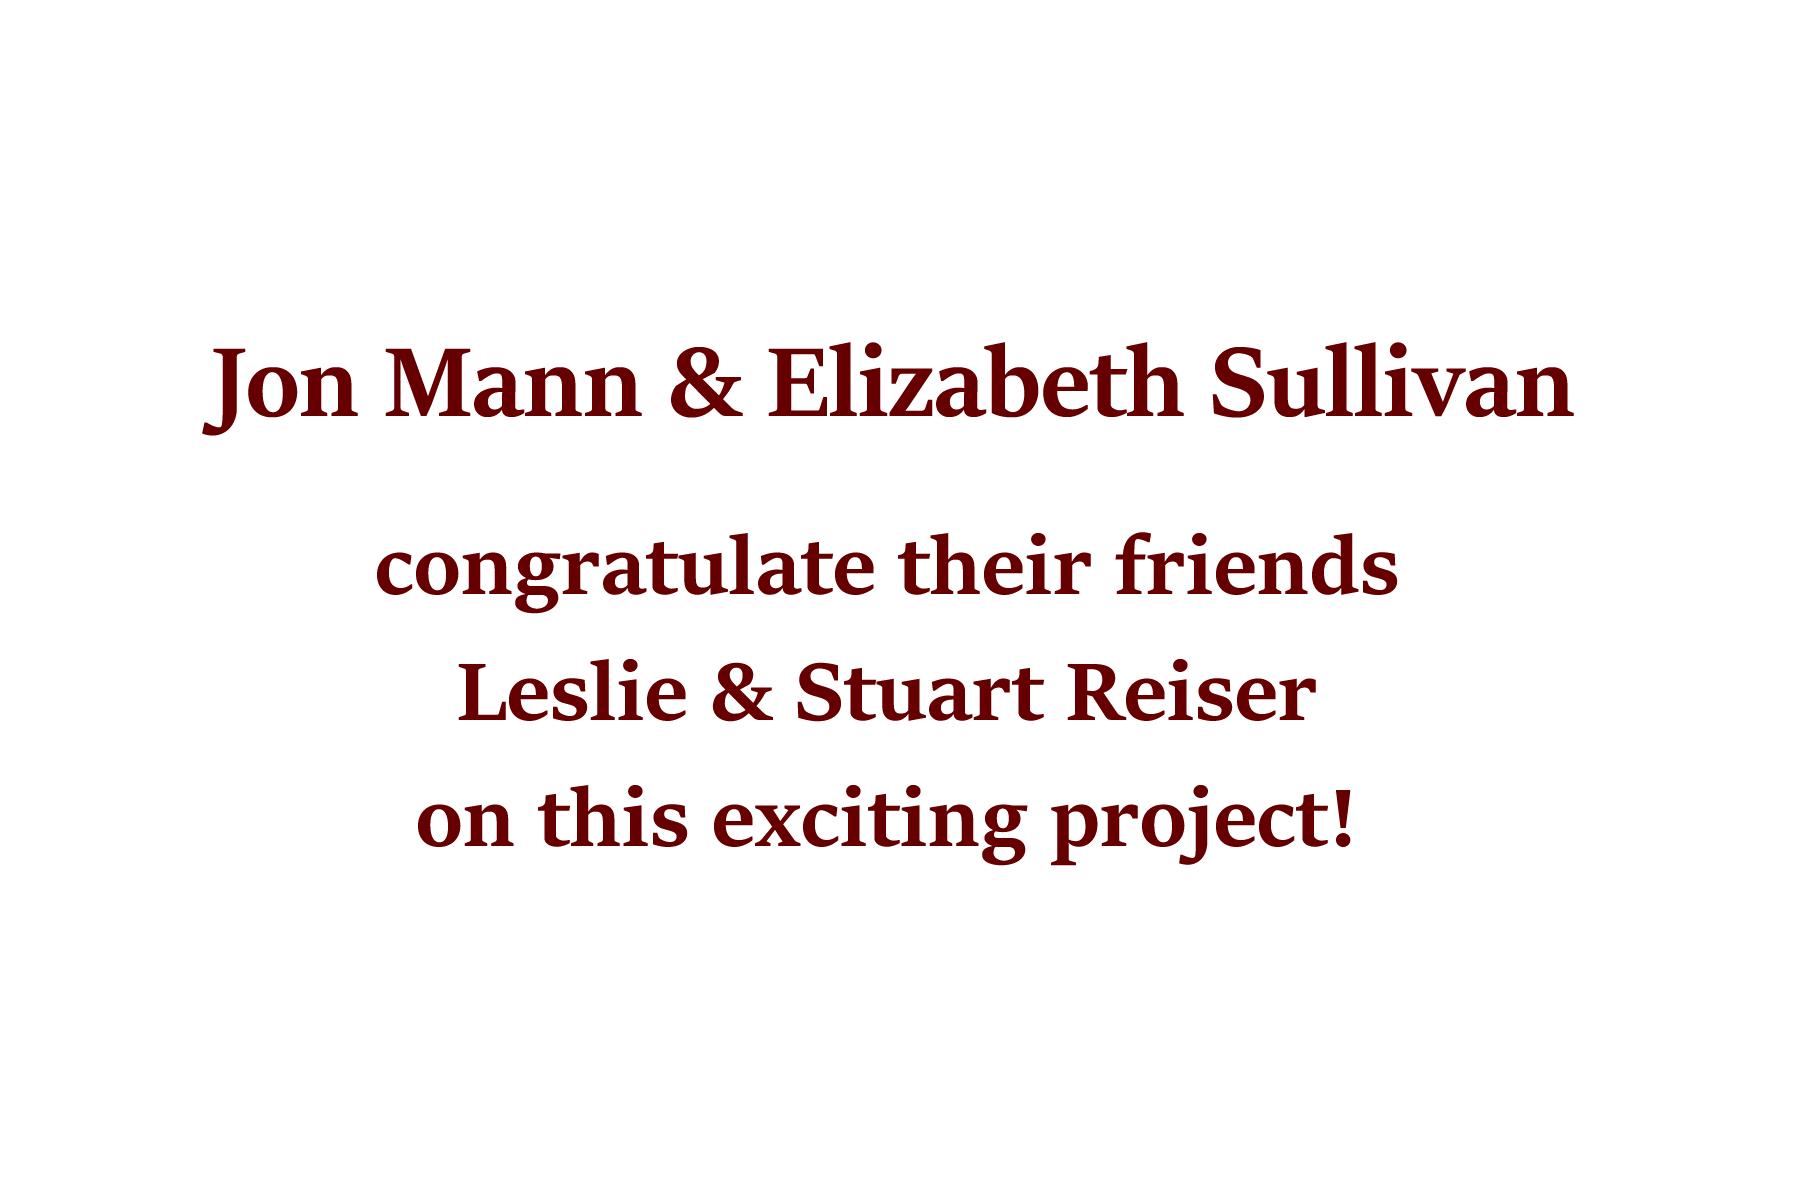 Jon Mann & Elizabeth Sullivan